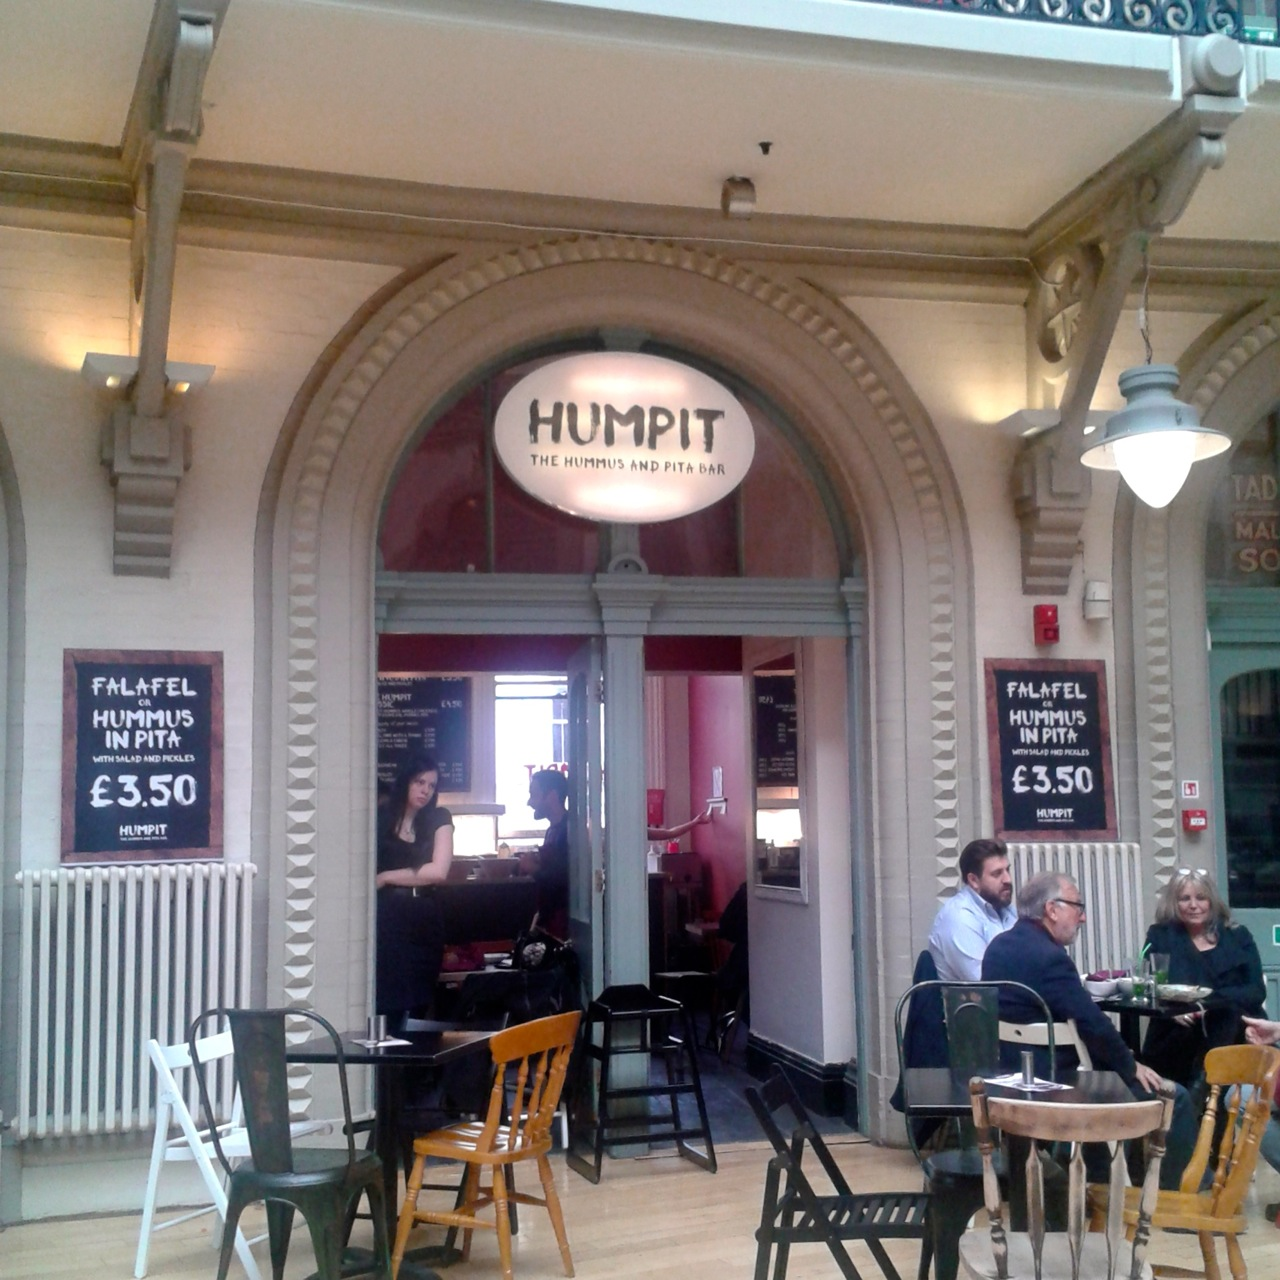 http://i2.wp.com/fatgayvegan.com/wp-content/uploads/2015/09/Humpit-in-Leeds.jpg?fit=1280%2C1280